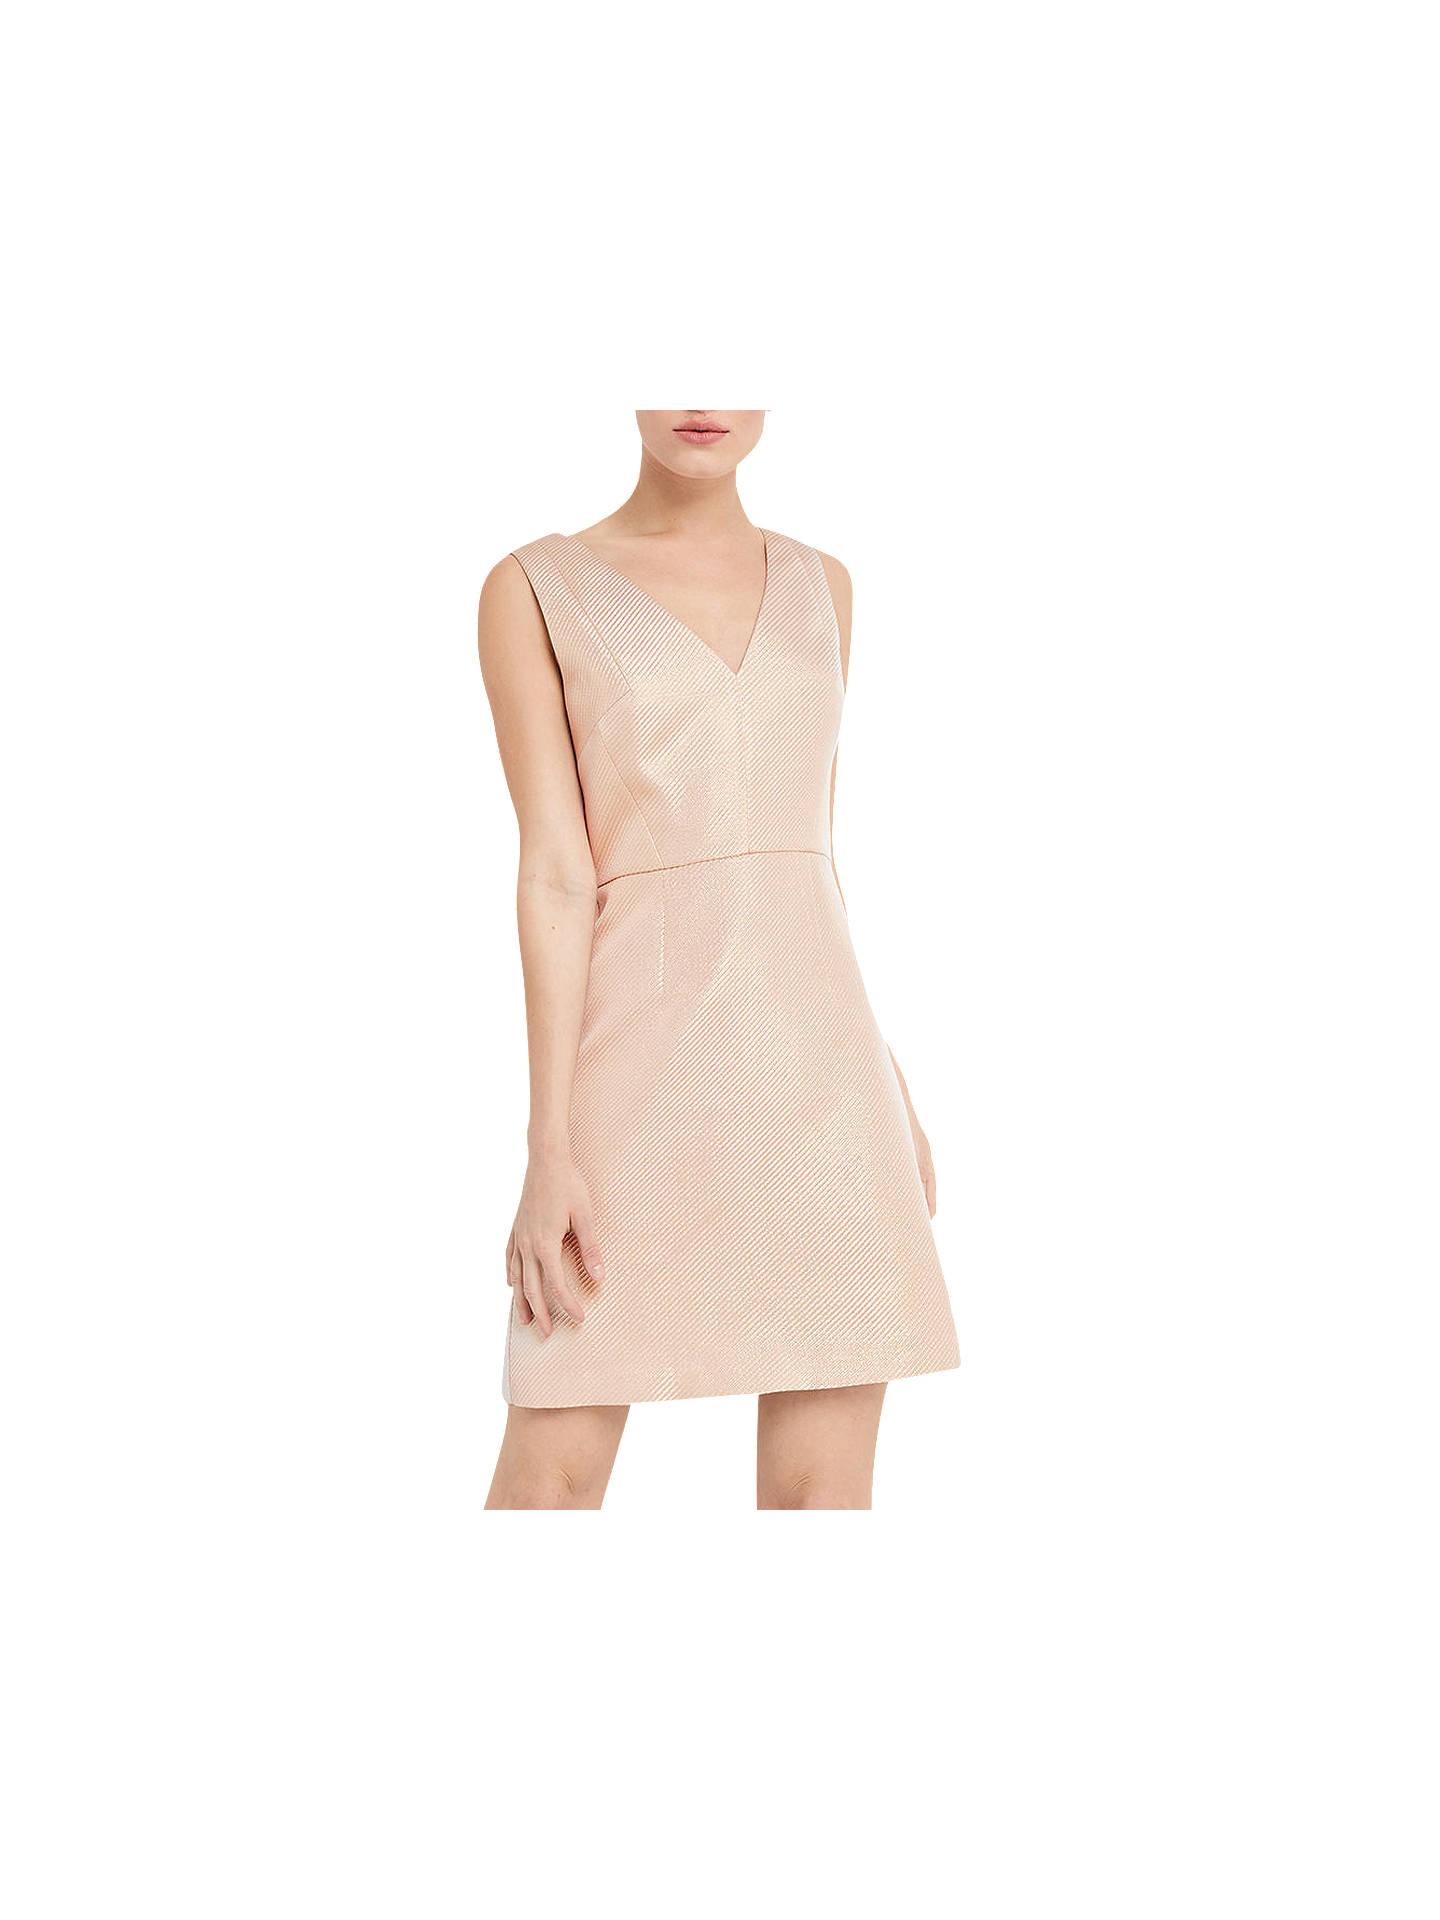 2a1fe4e8ee20 Buy Oasis Metallic Skater Dress, Gold, 8 Online at johnlewis.com ...